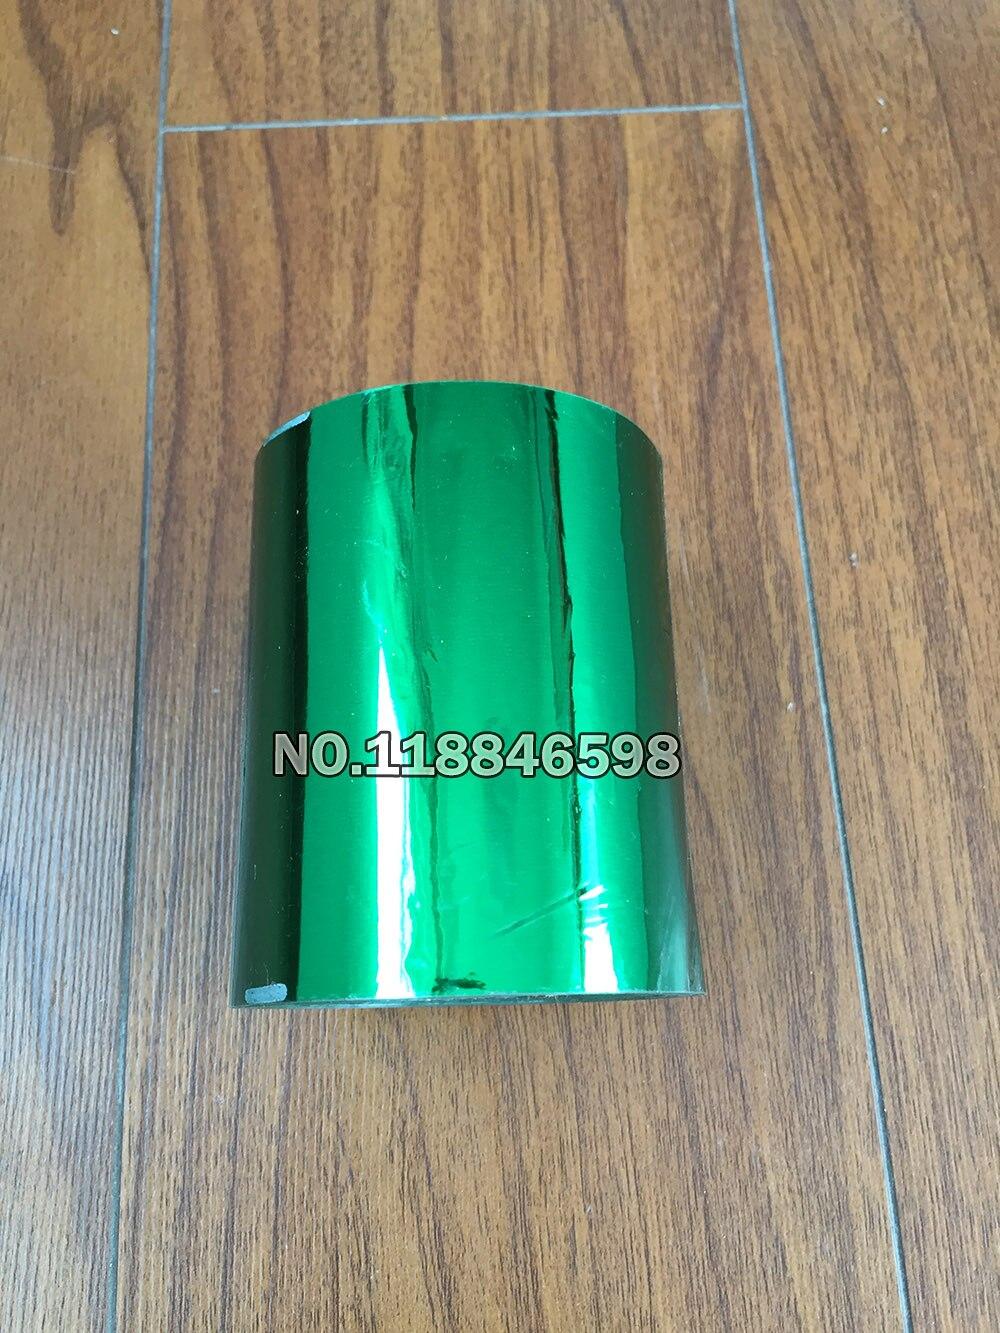 Green Color 80mm Width PVC Business Card Emboss Hot Foil Stamping Heat Transfer Hot Foil Paper